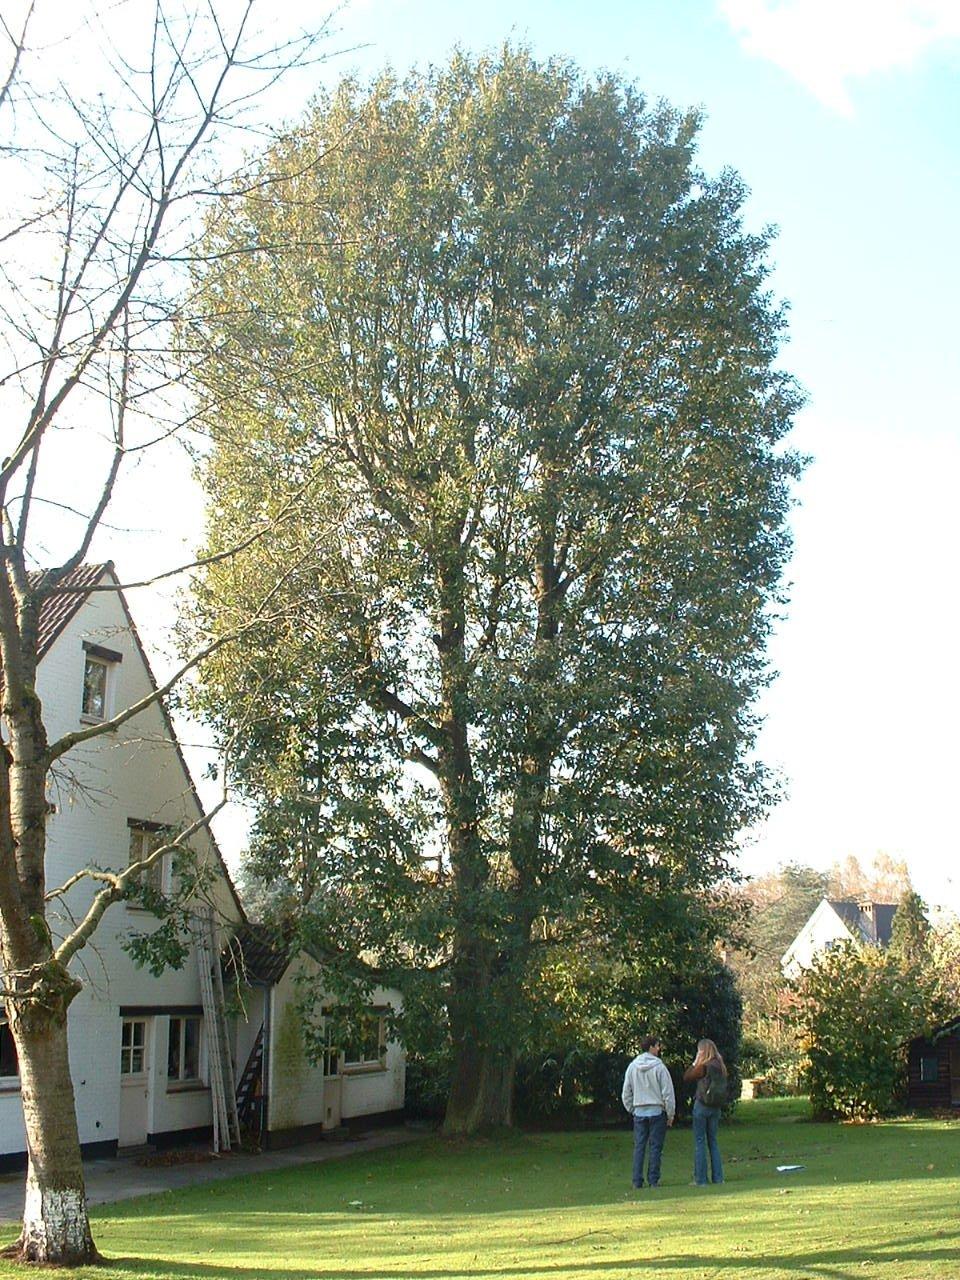 Wintereik – St.- Pieters - Woluwe, Patrijzendal, 1 –  28 Oktober 2002